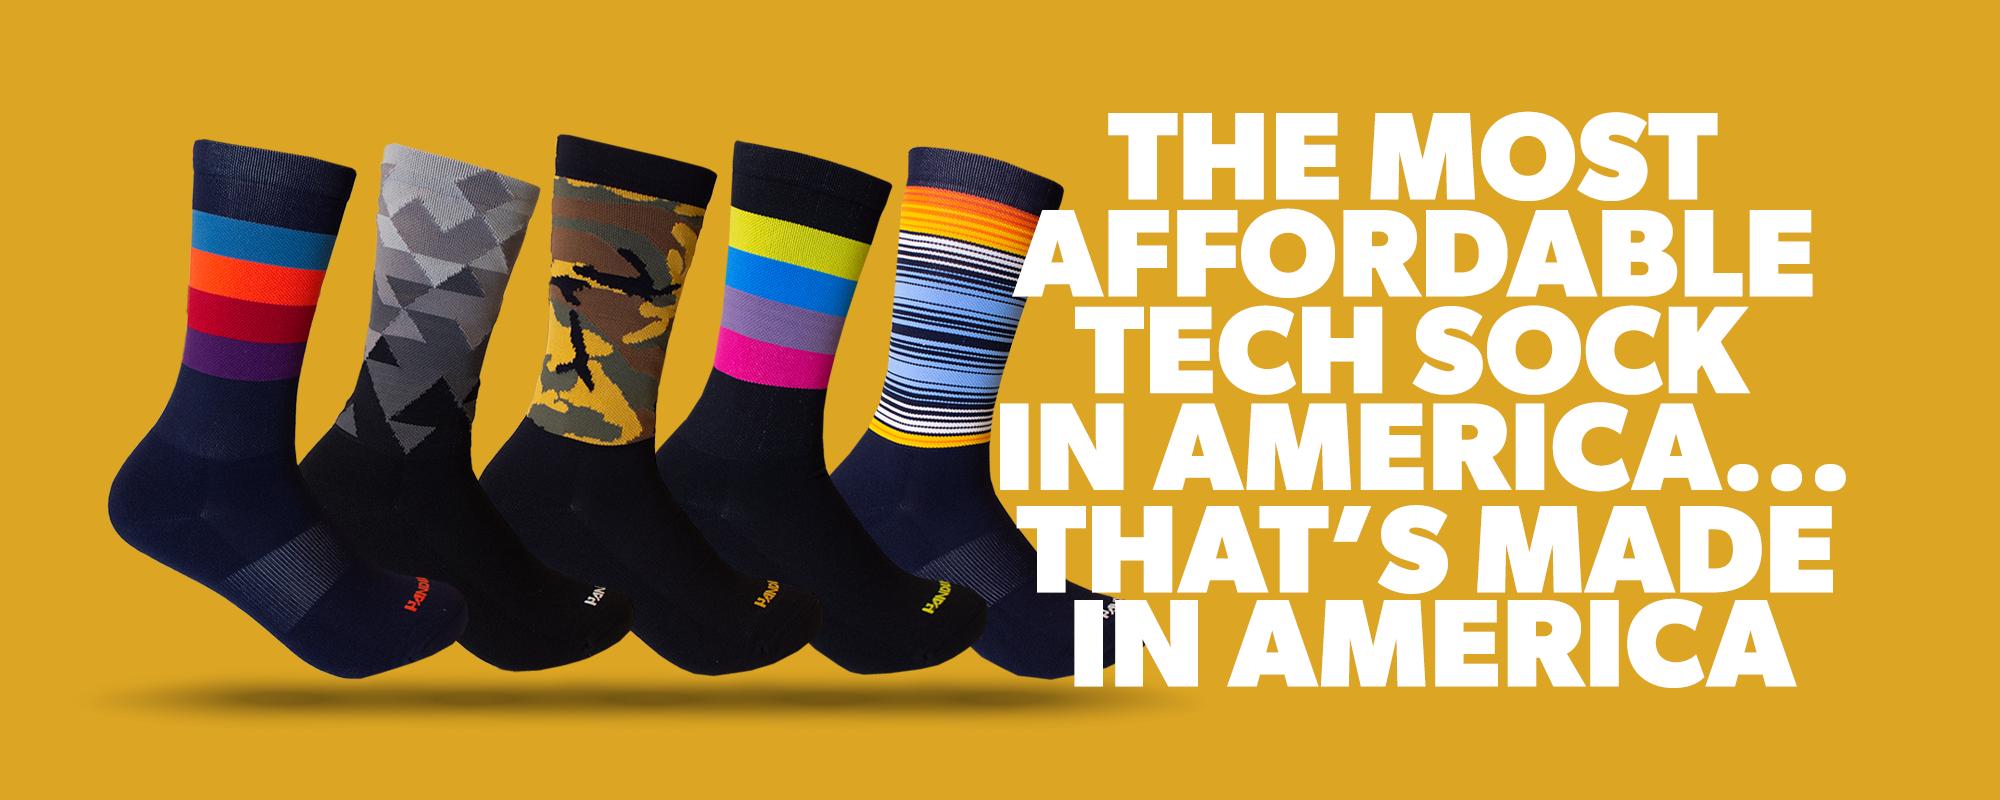 footdown socks